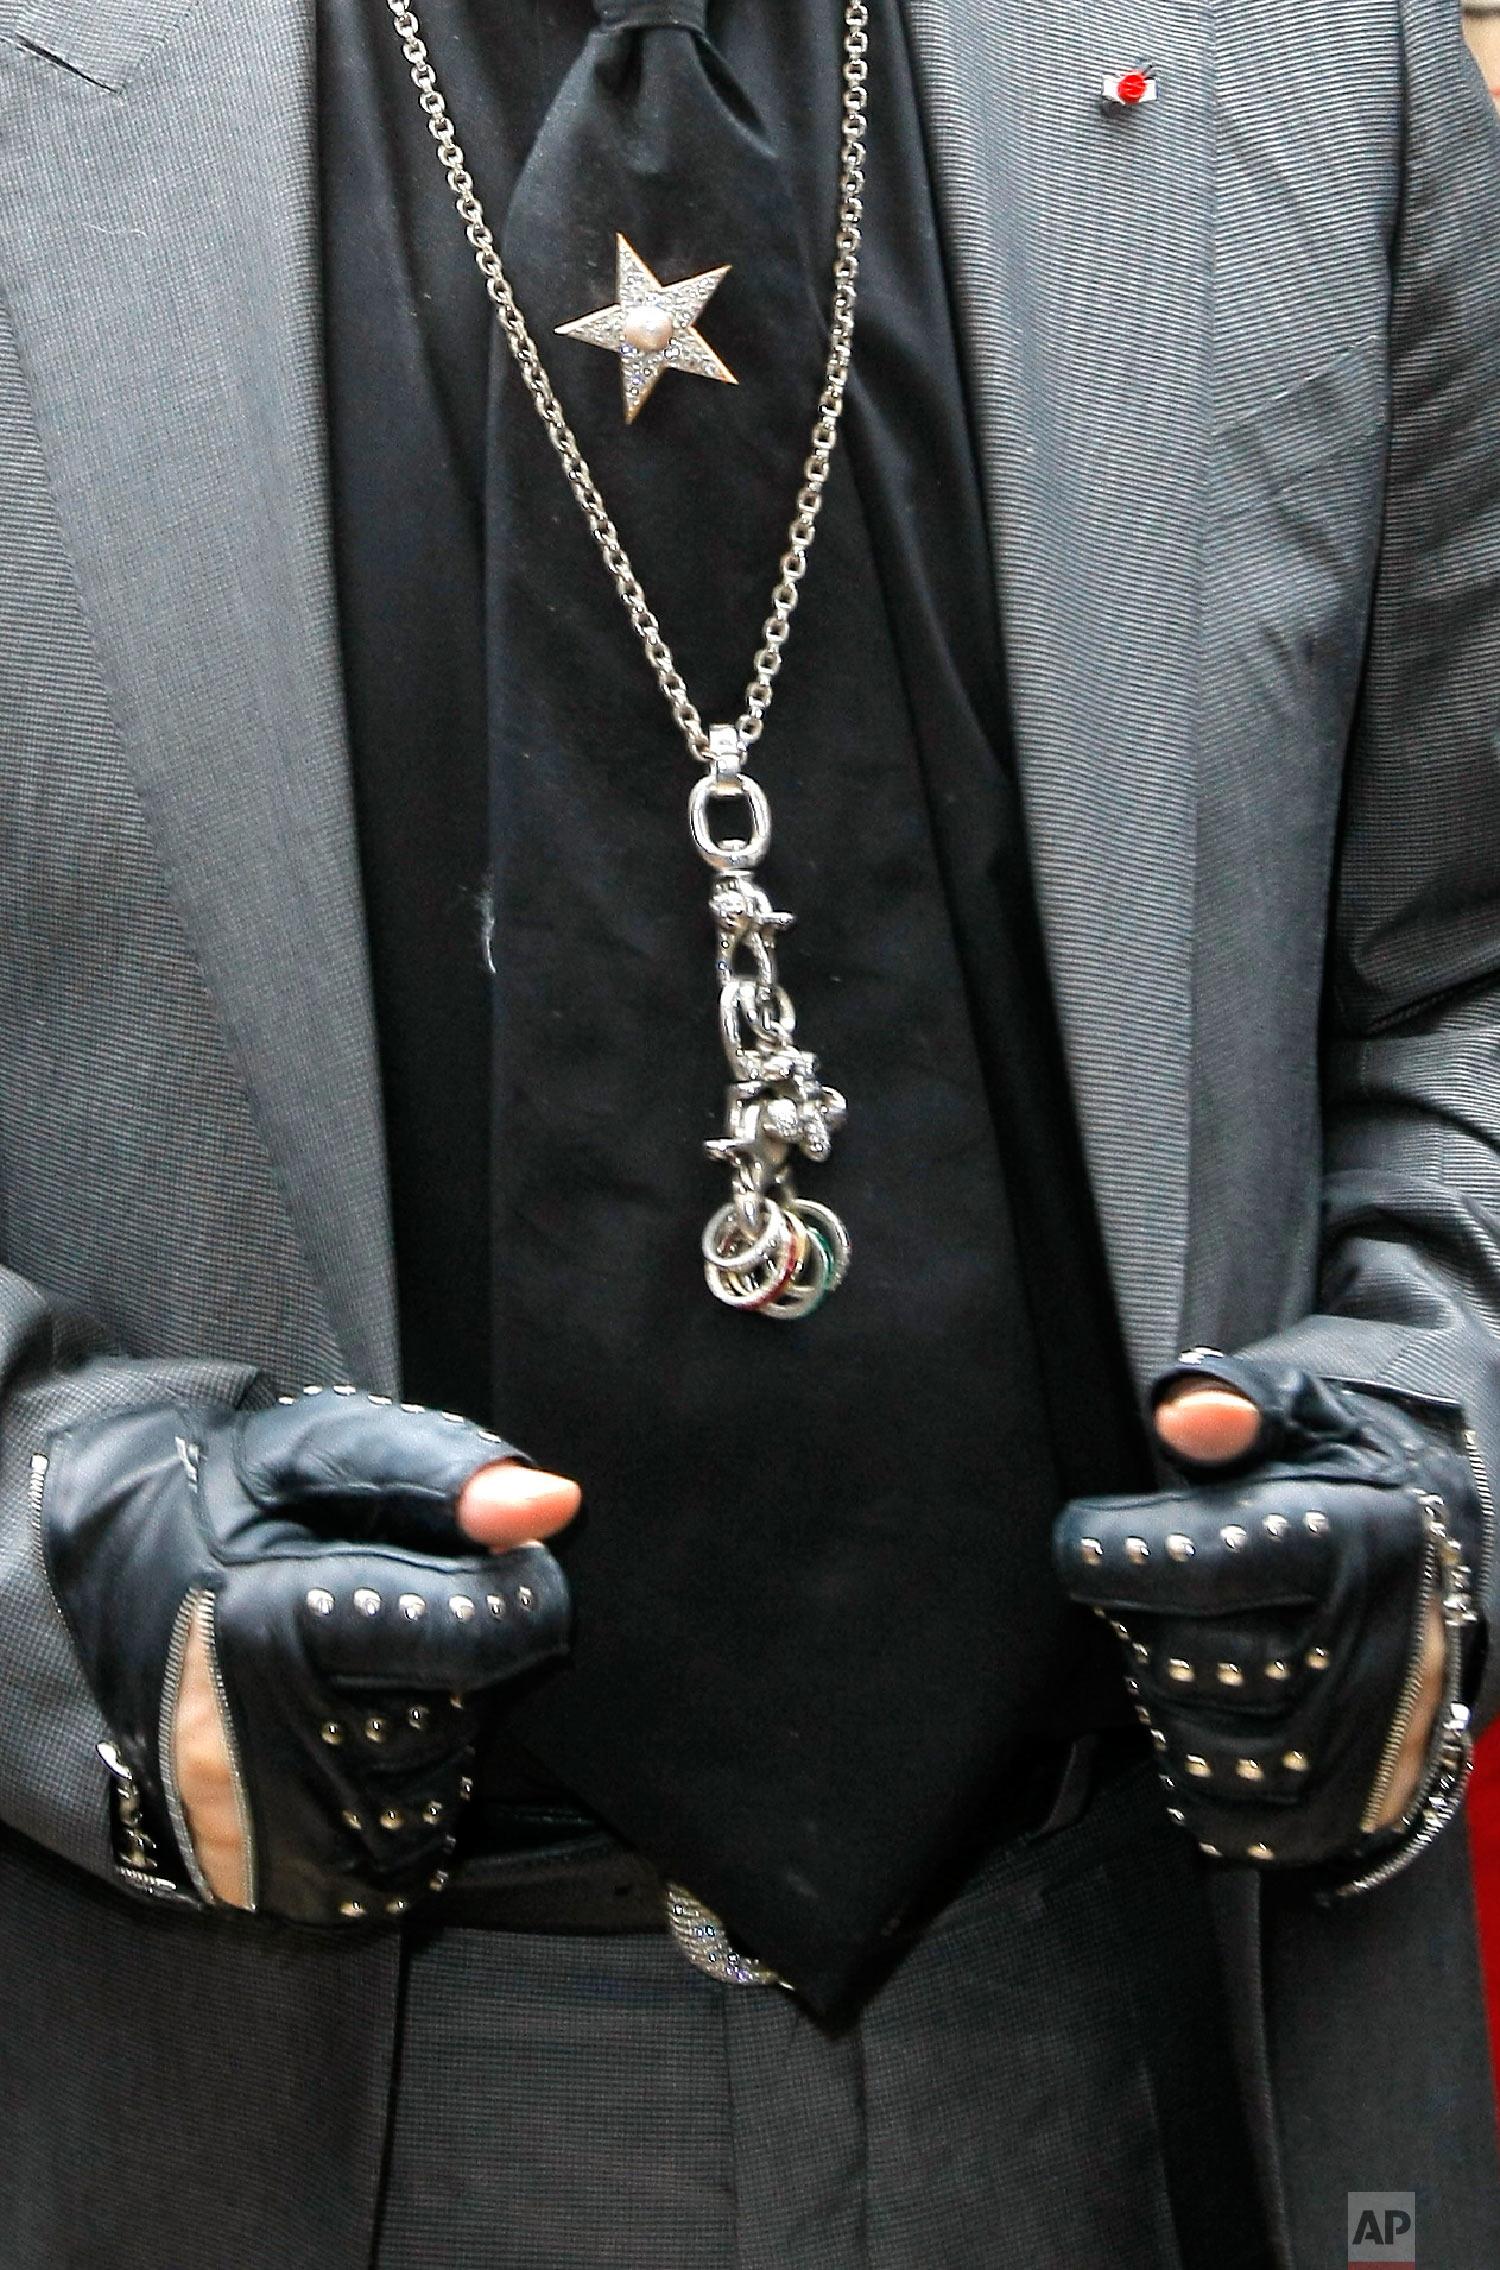 Lagerfeld's arrives to promote a commercial April, 28, 2011 in Paris. (AP Photo/Jacques Brinon)